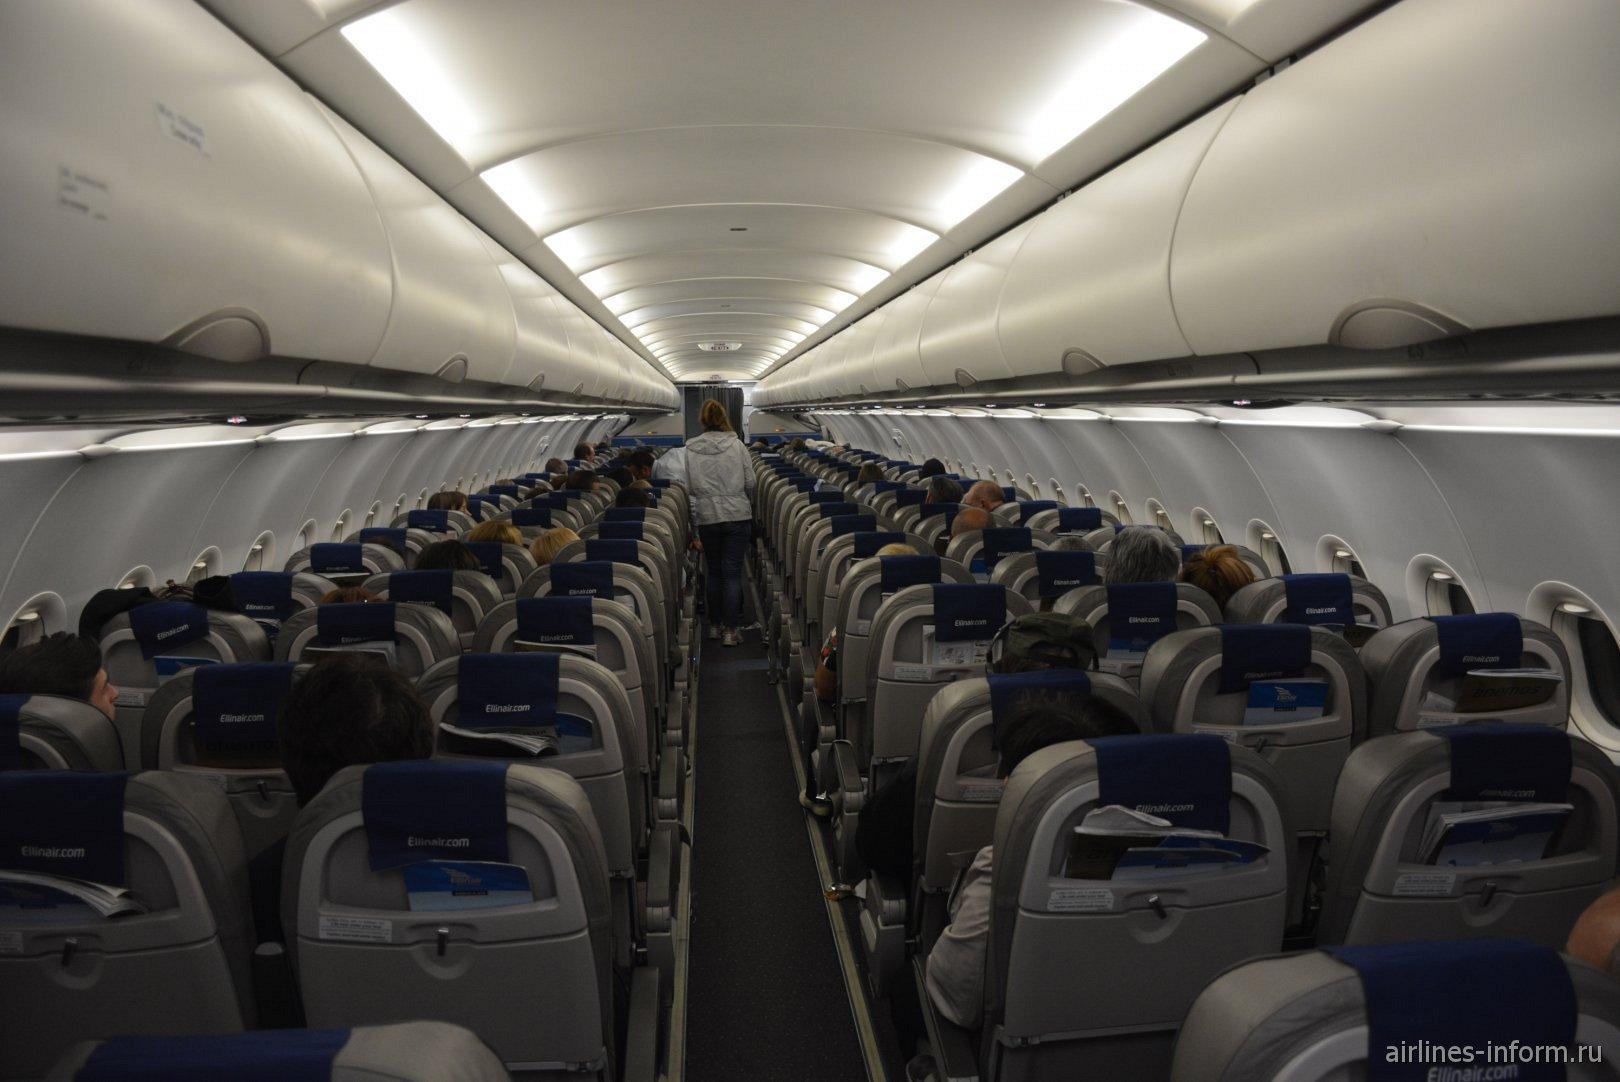 Пассажирский салон самолета Airbus A319 авиакомпании Ellinair